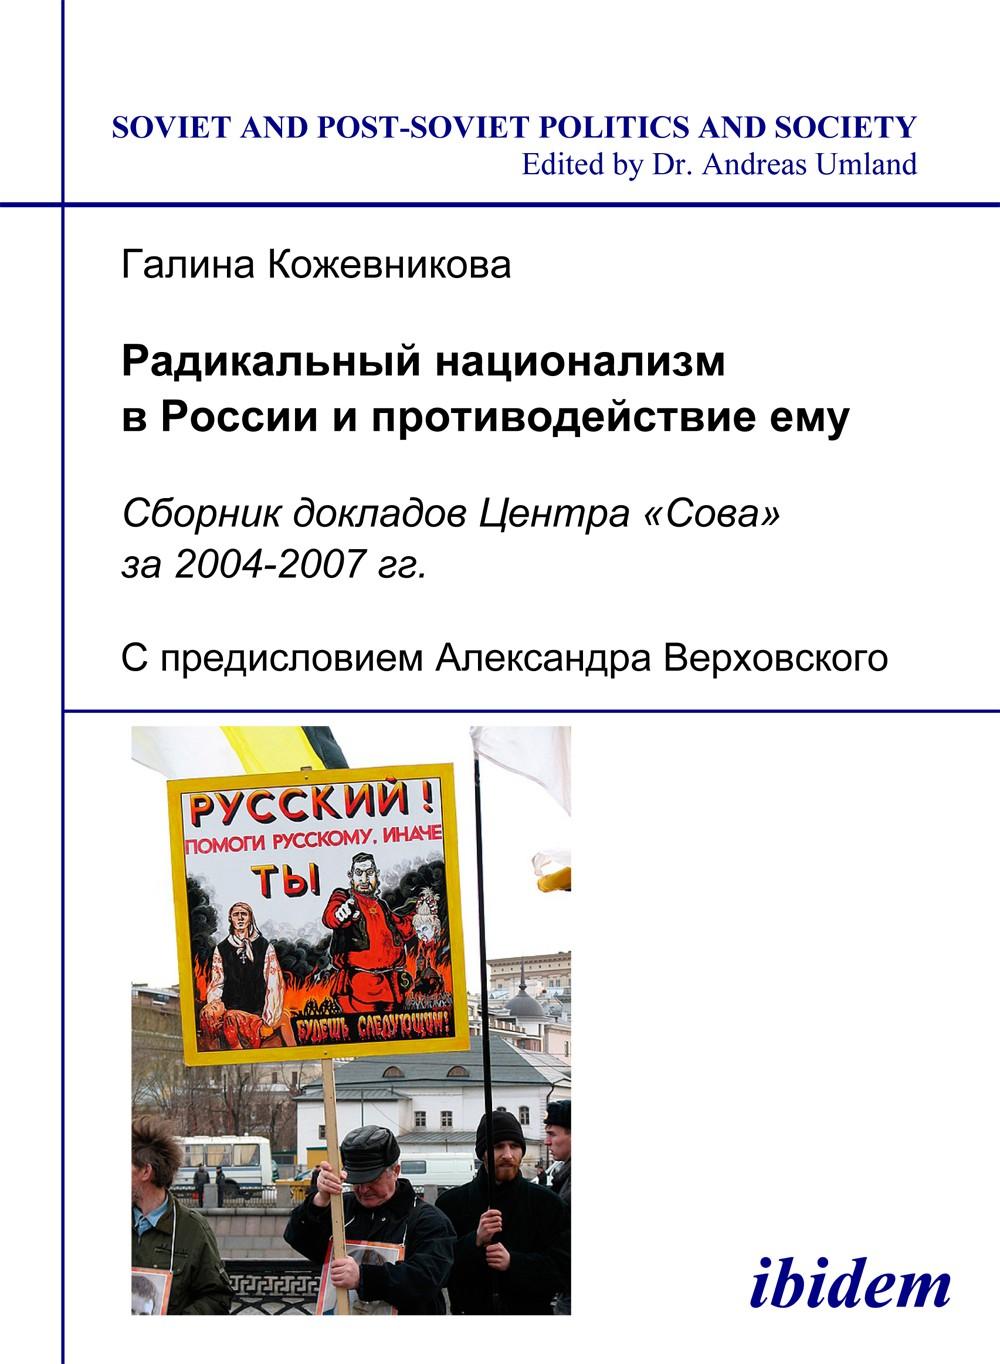 Radikal'nyi natsionalizm v Rossii i protivodeistvie emu